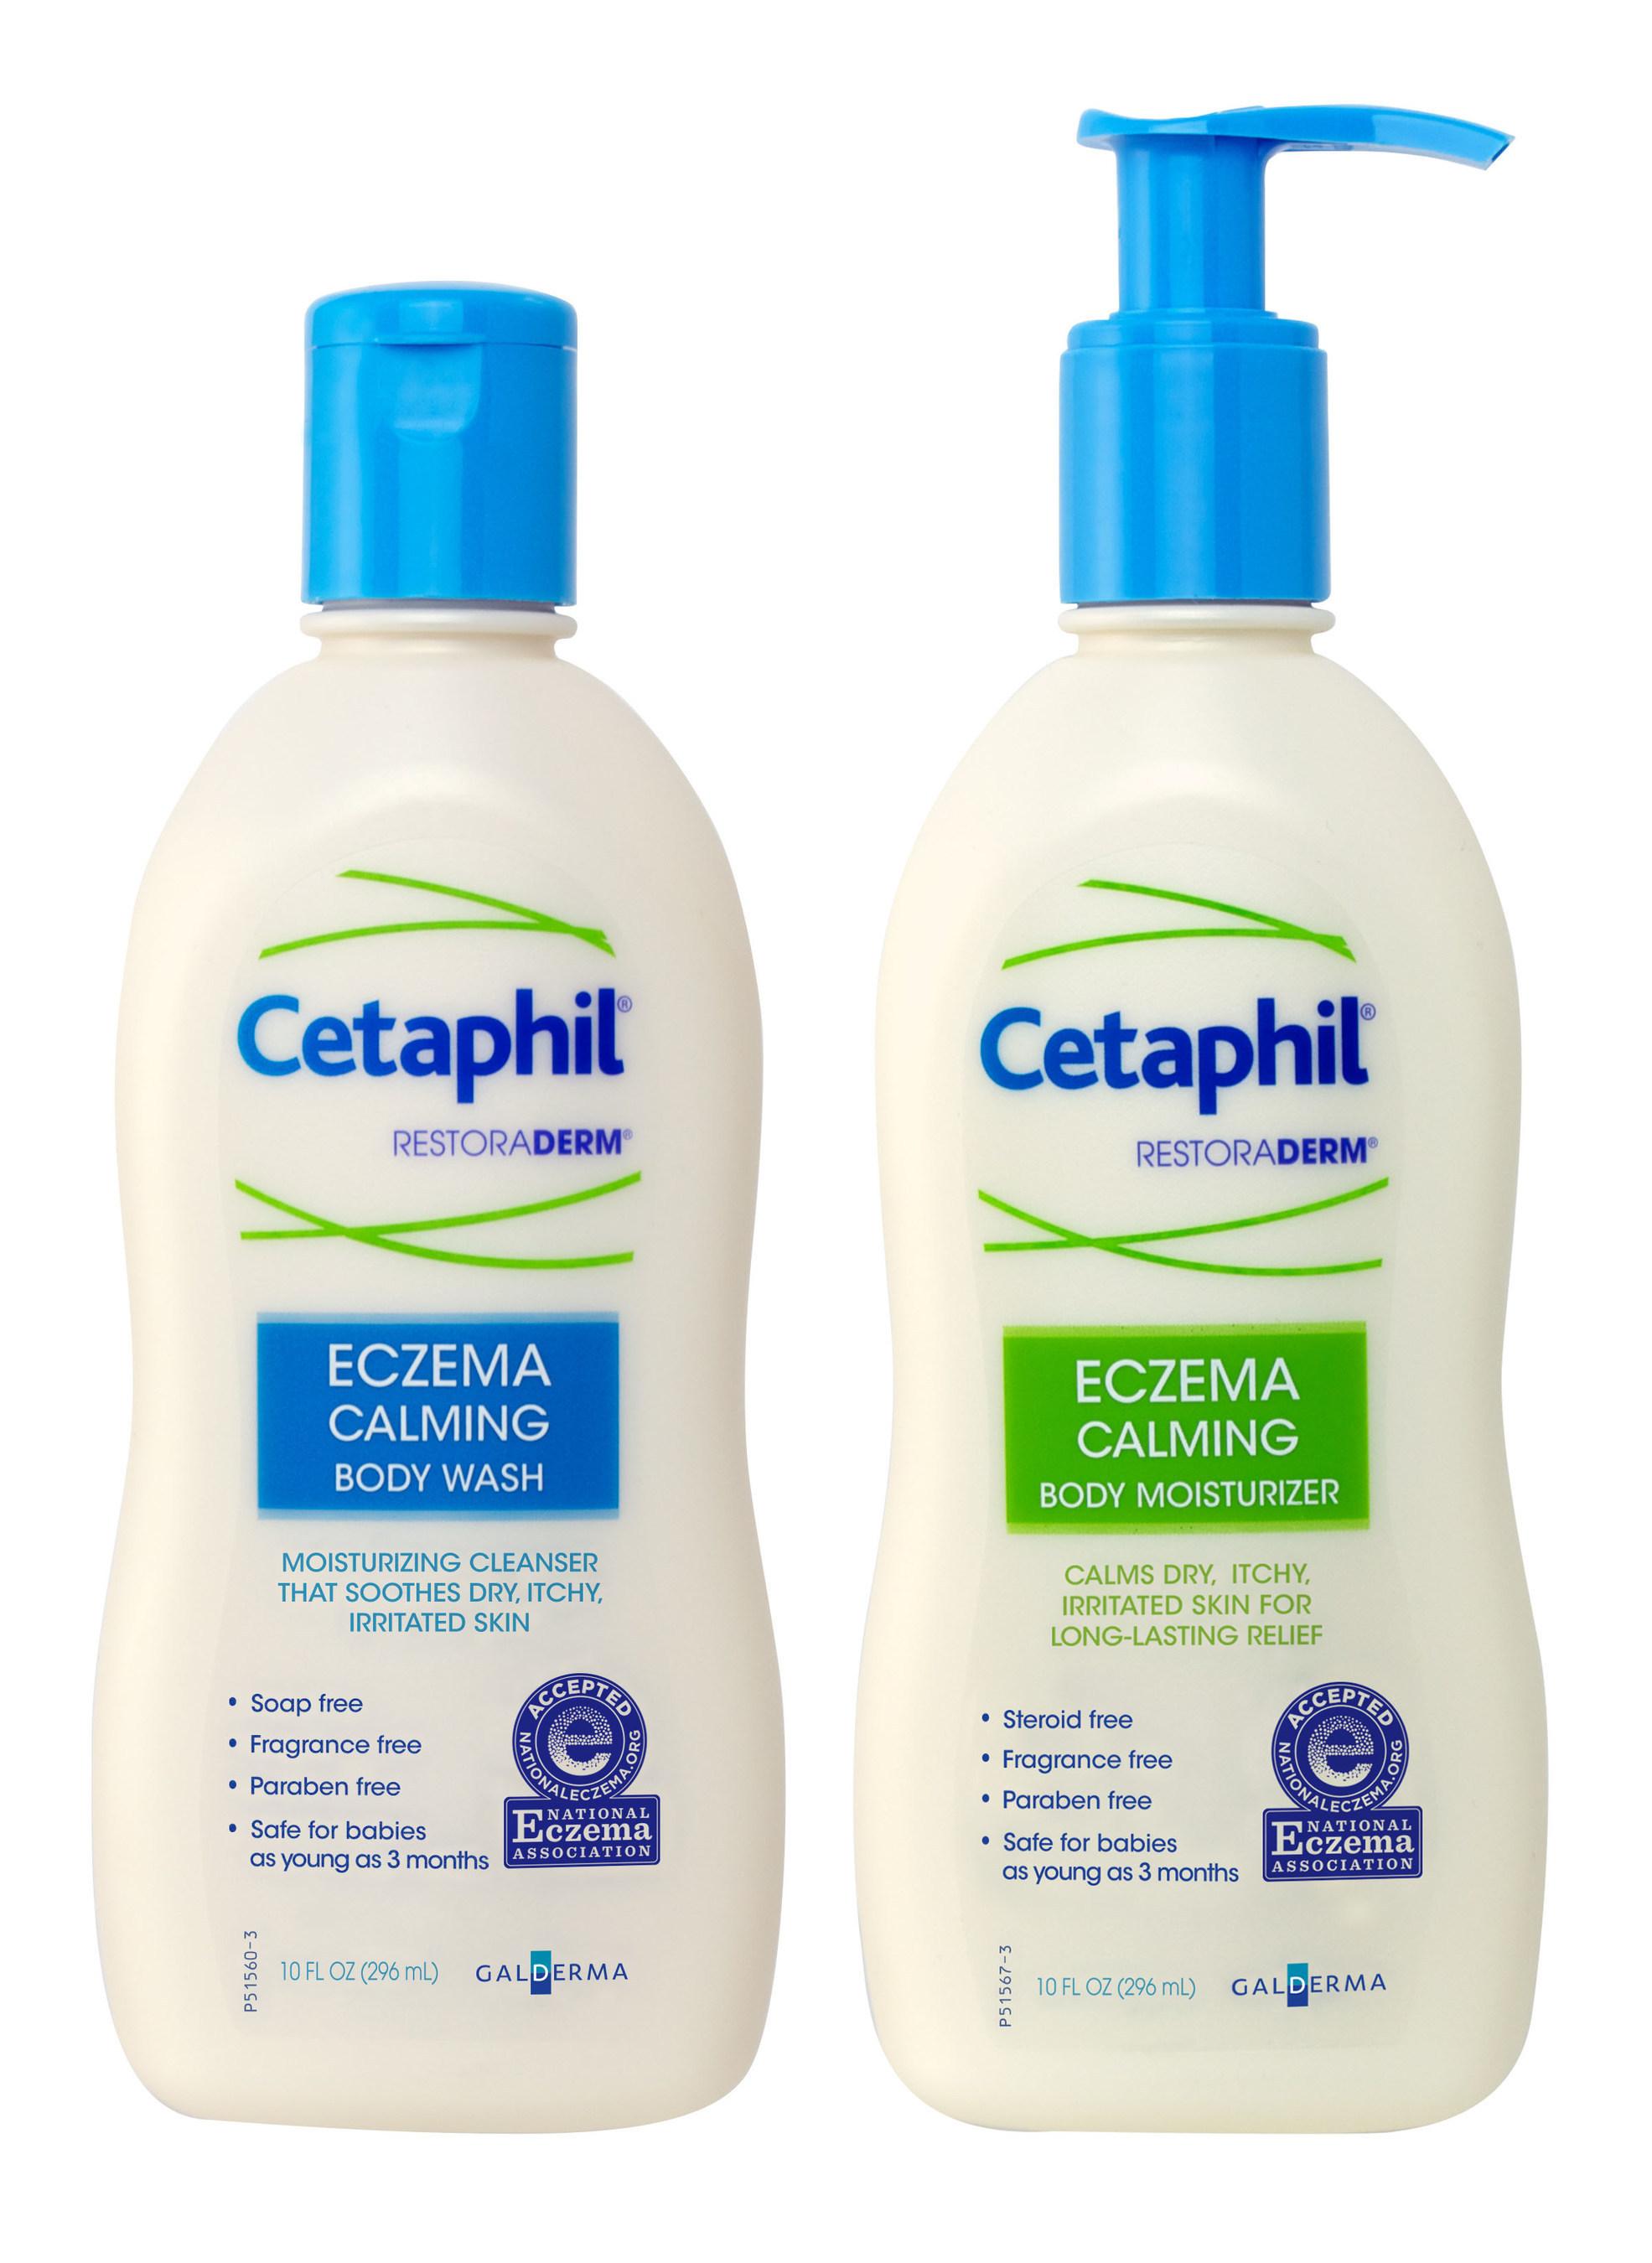 The Cetaphil 174 Brand Revamps Restoraderm 174 Product Line